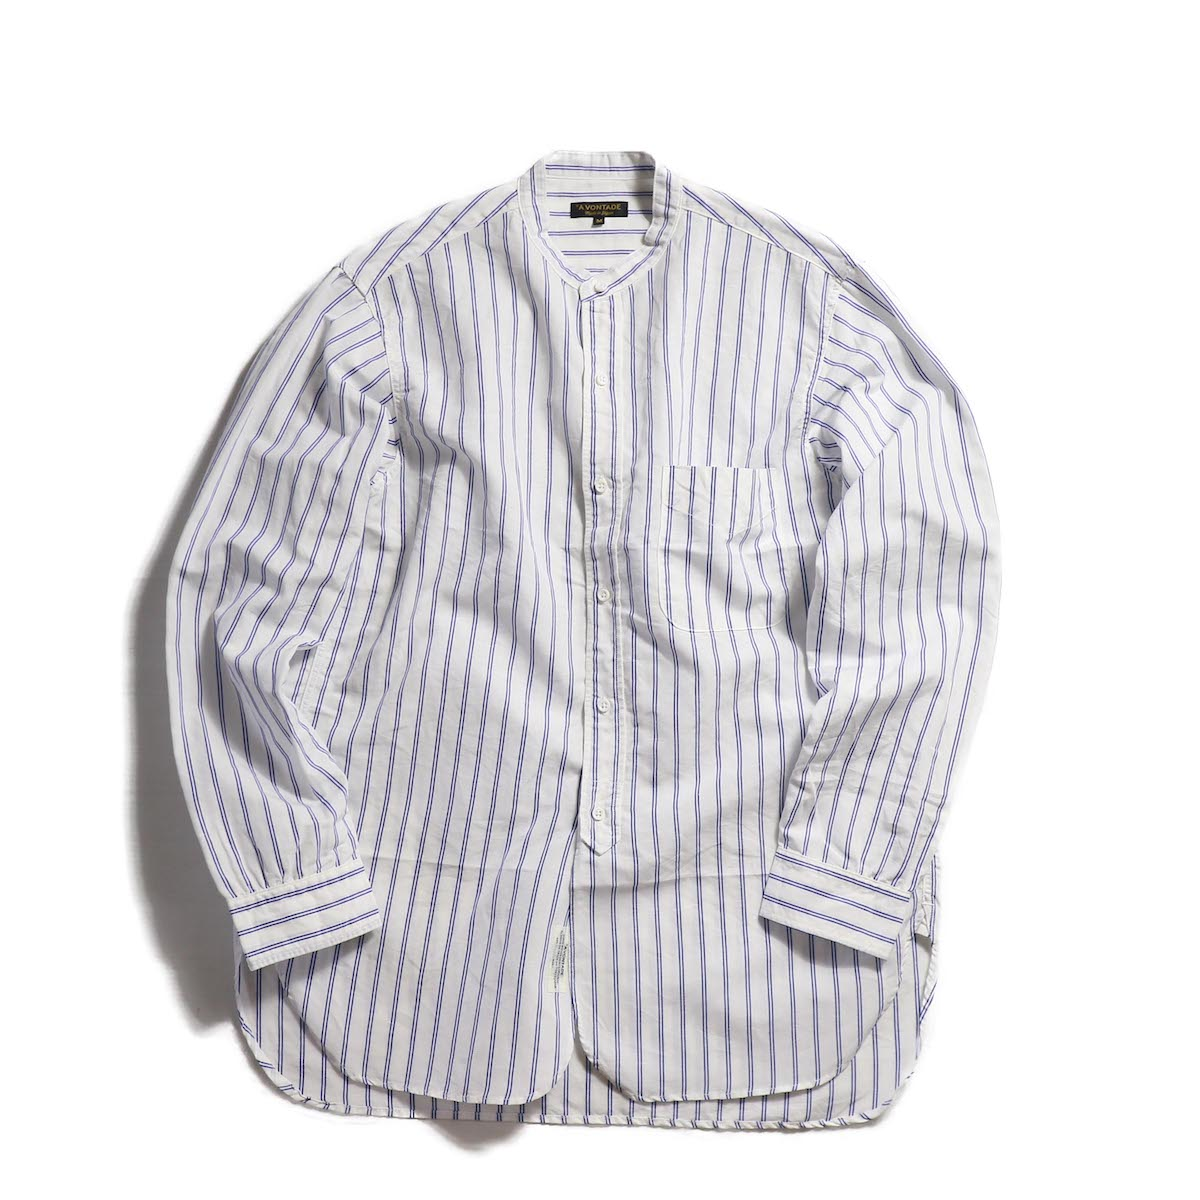 A VONTADE / Banded Collar Shirt -Blue Stripe